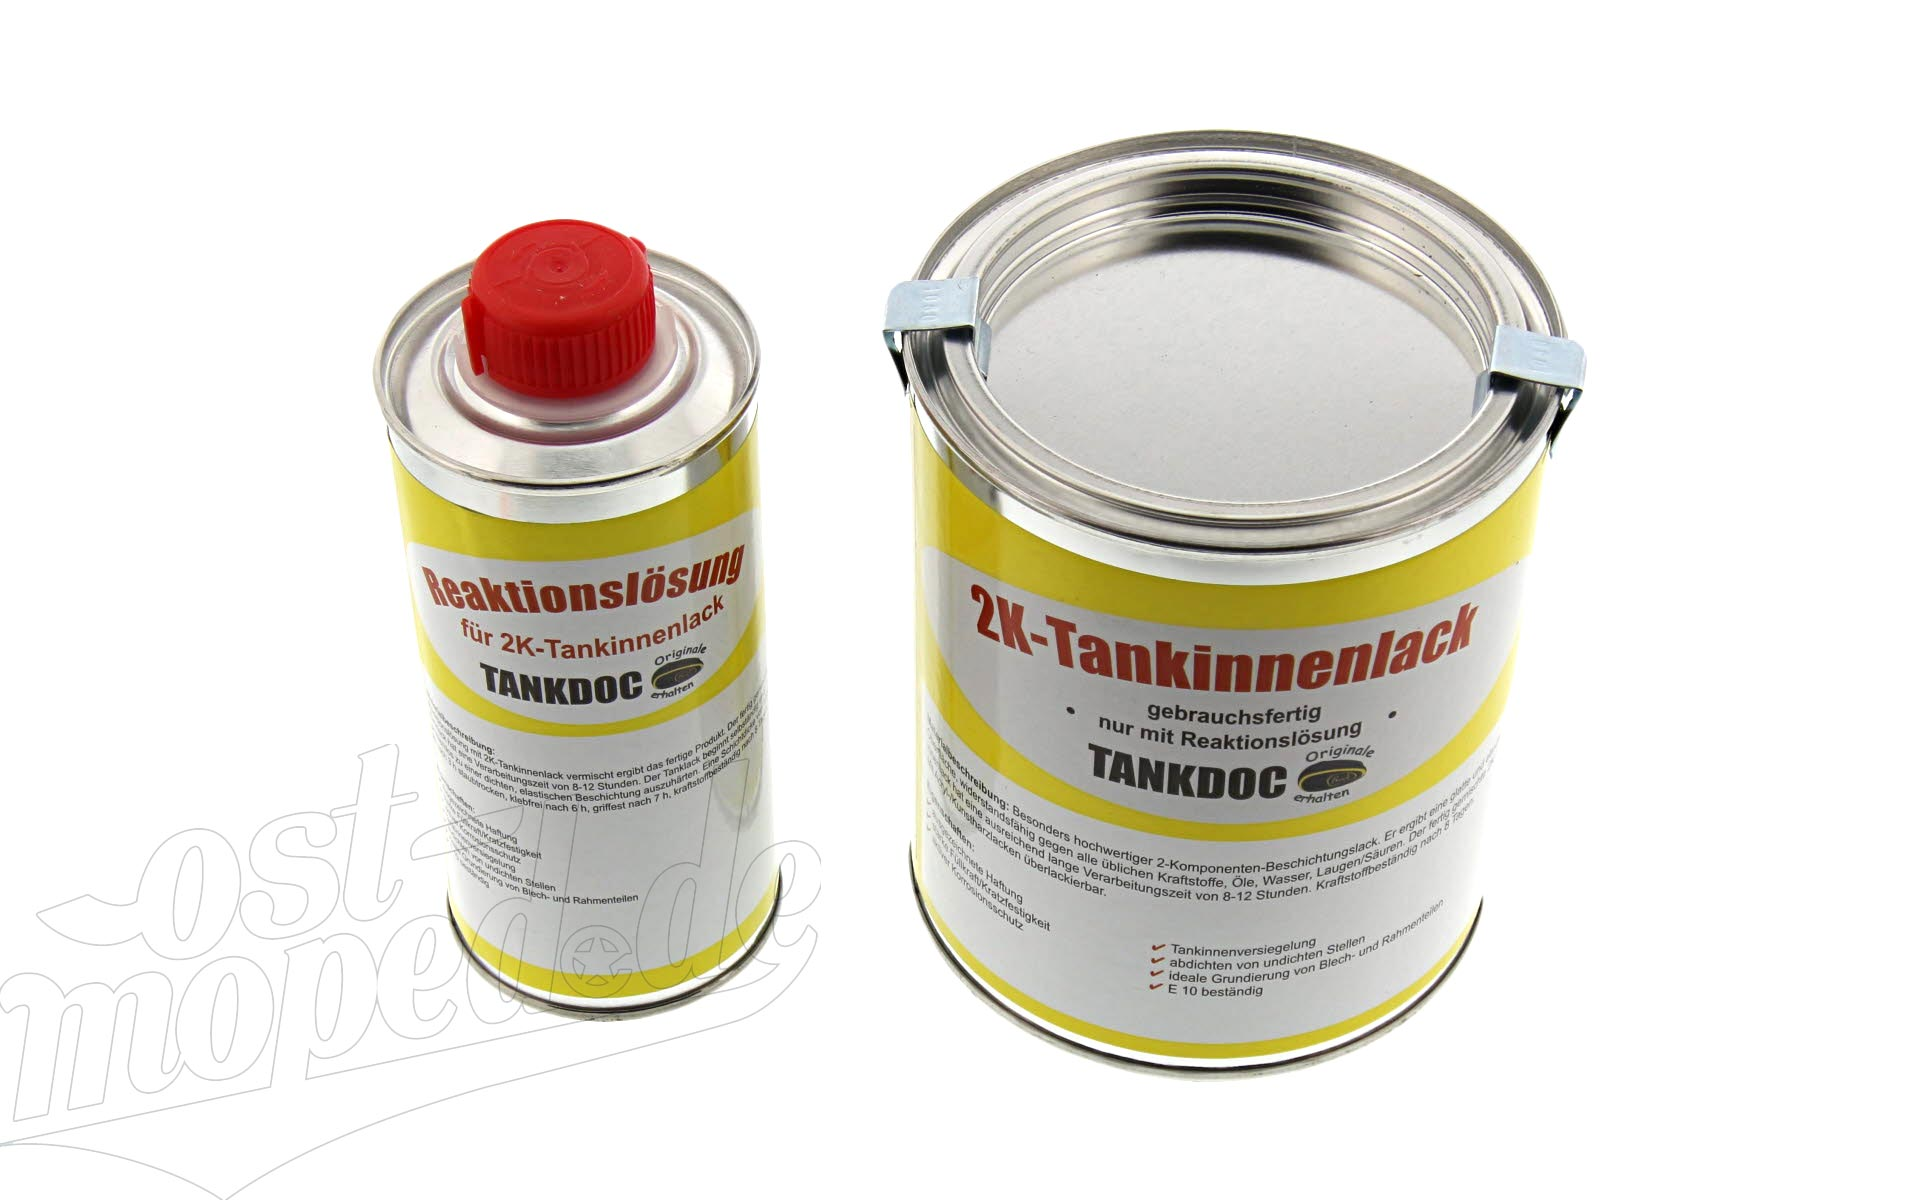 2K-Tankinnenlack (Tankinnenlack+Reaktionslösung) Tankinnenlack 540g und Reaktionslösung 135g  (Einze